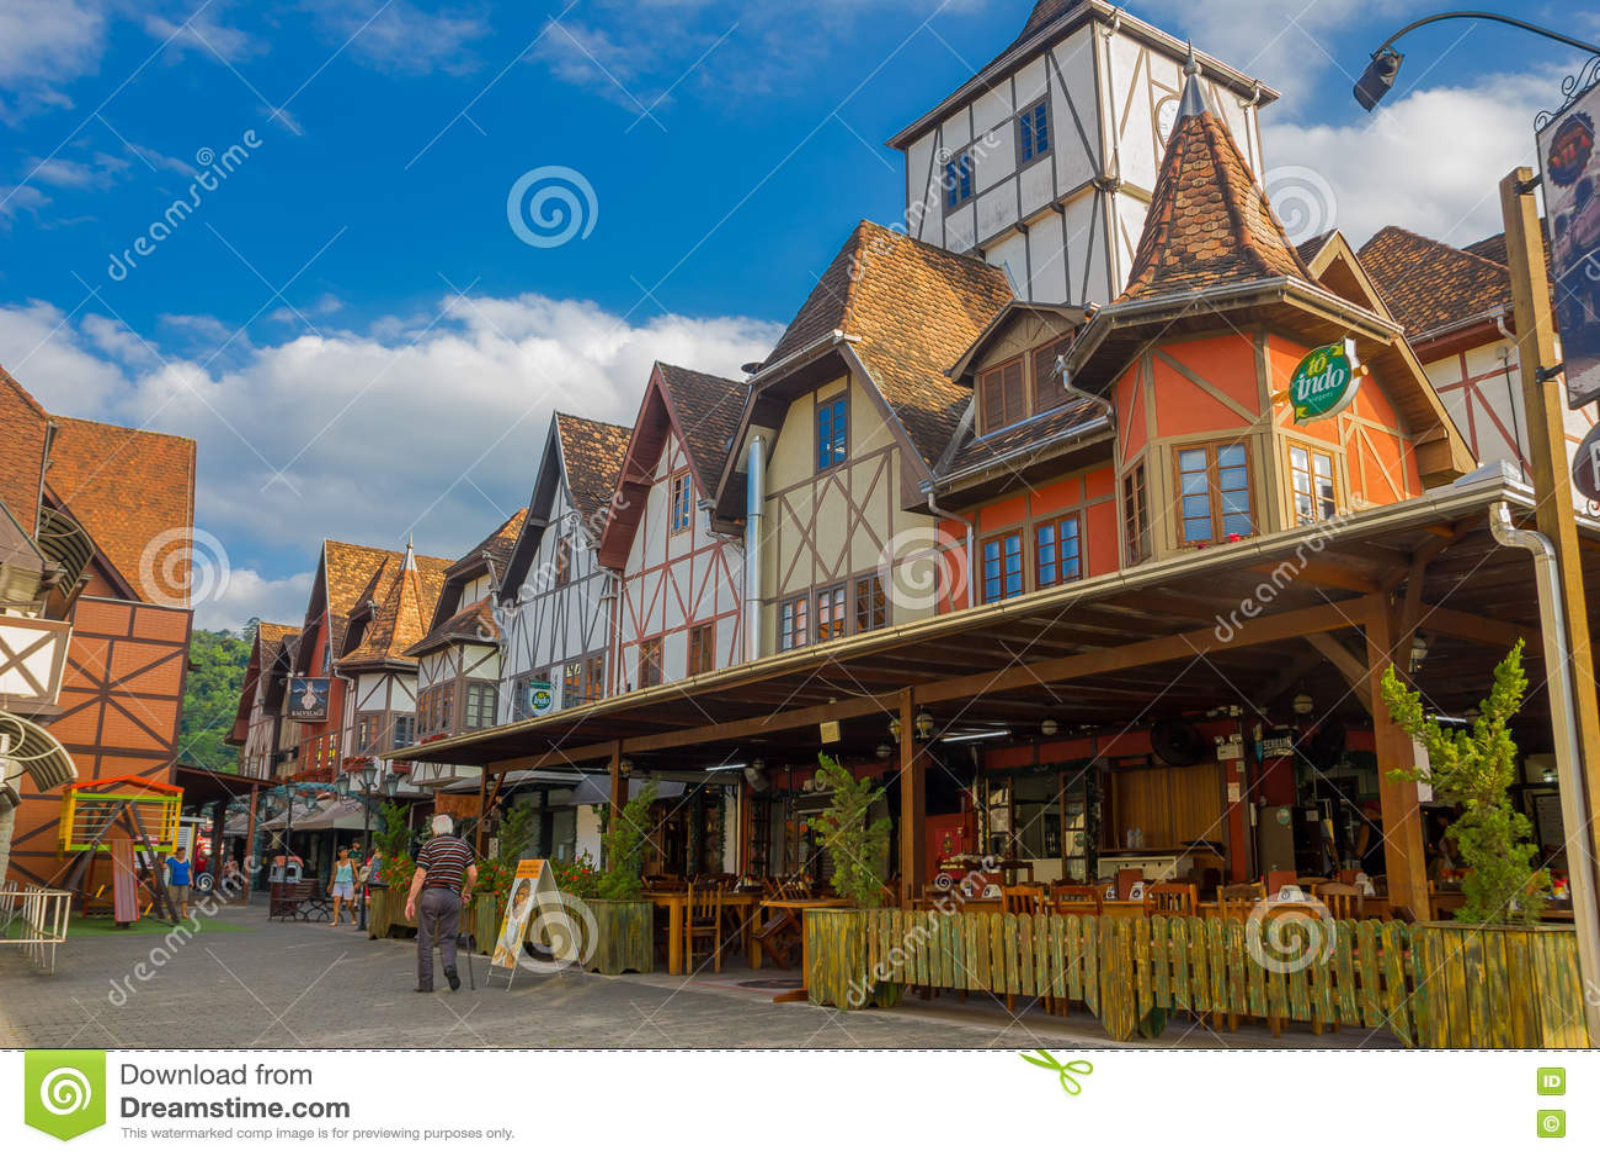 BLUMENAU, BRAZIL - MAY 10, 2016: nice local restaurant in the corner of the street, german style houses